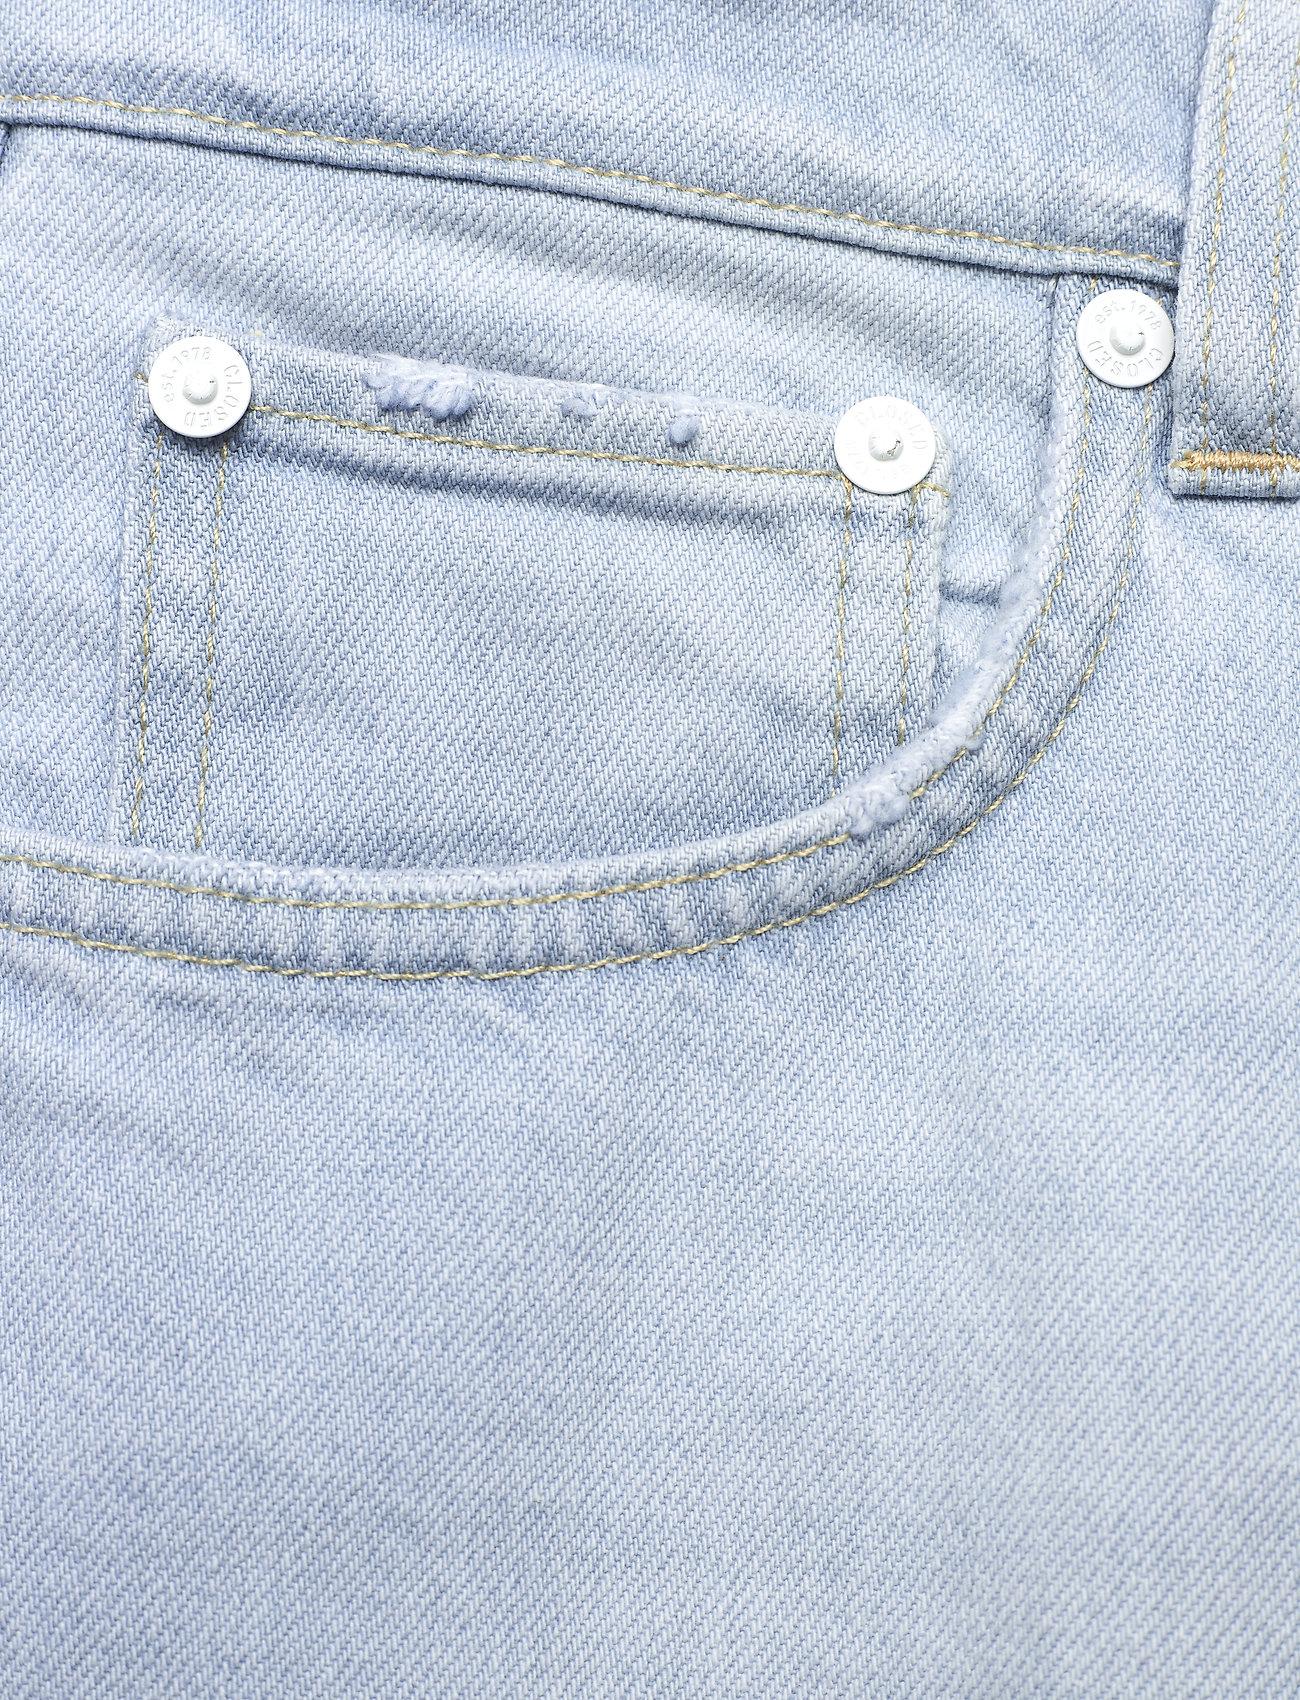 Closed - womens pant - straight regular - light blue - 2